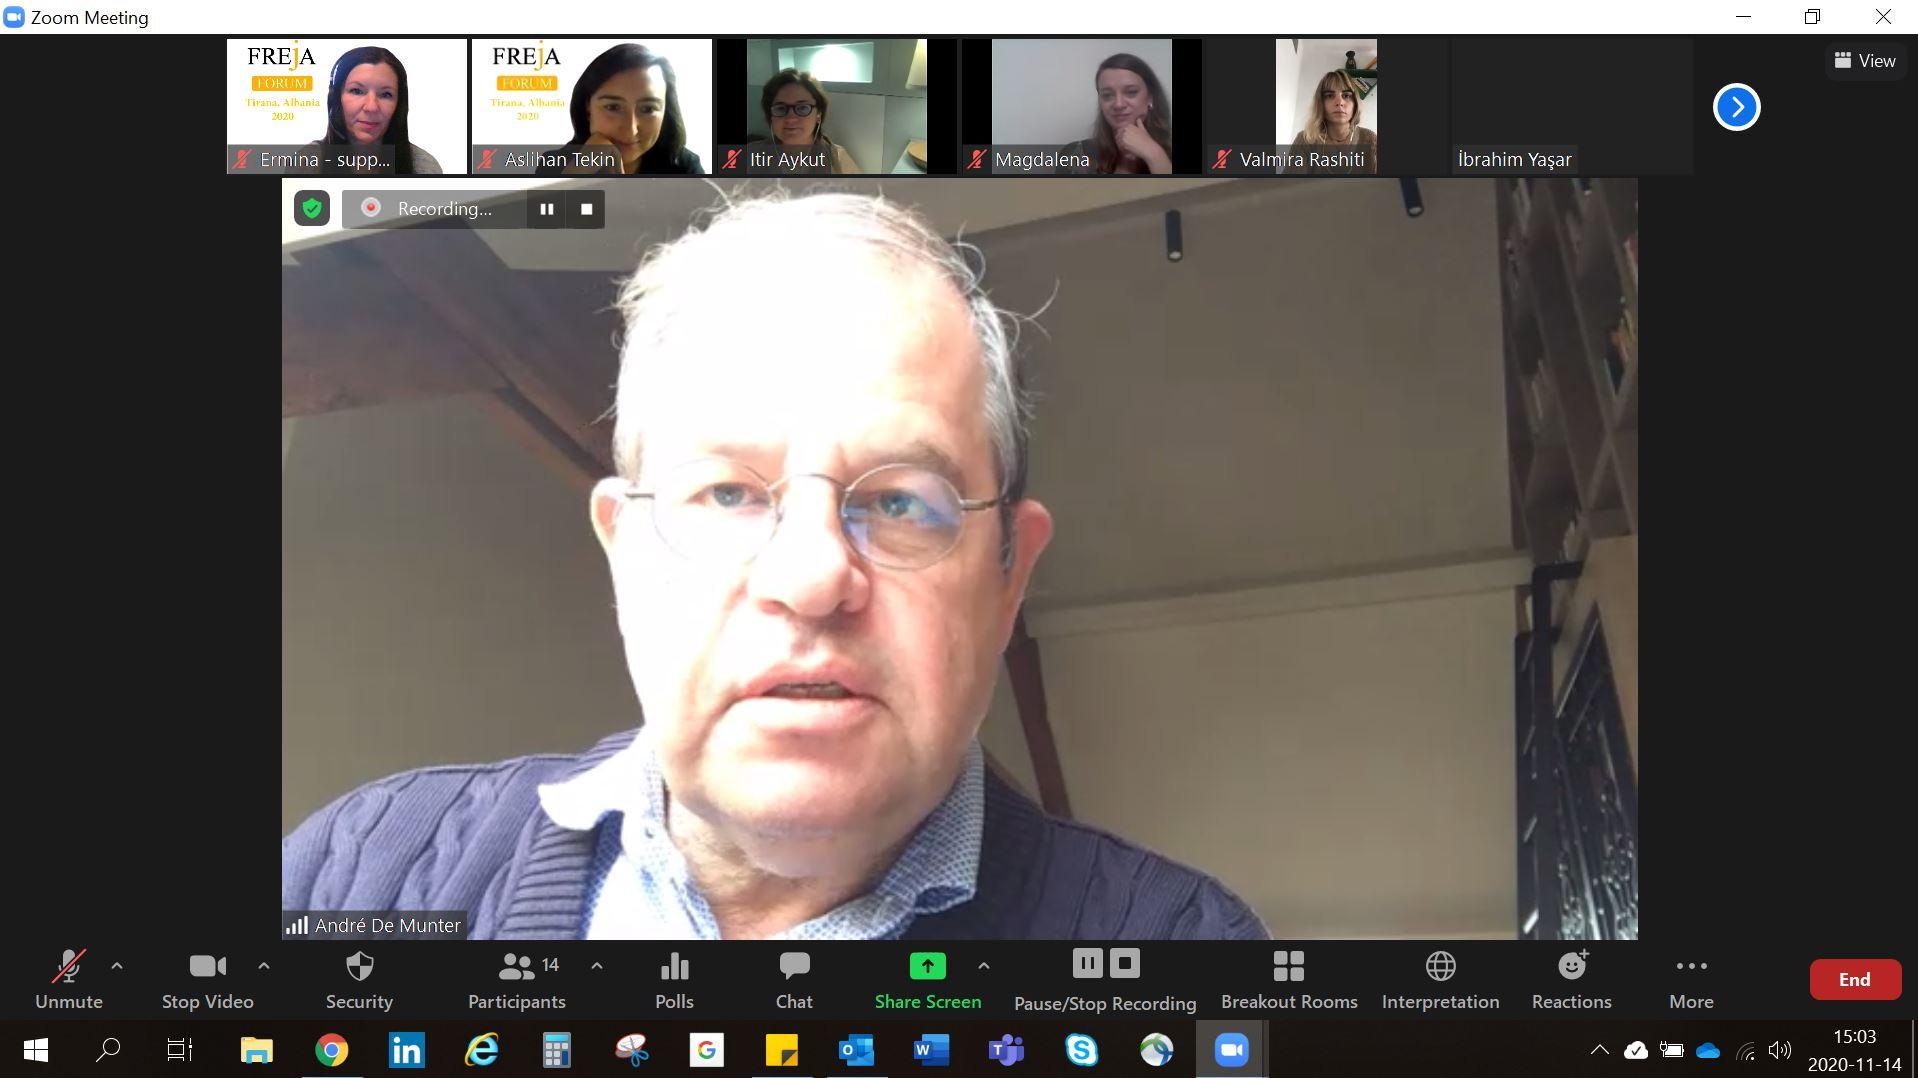 Man with glasses, at digital meeting, talking.